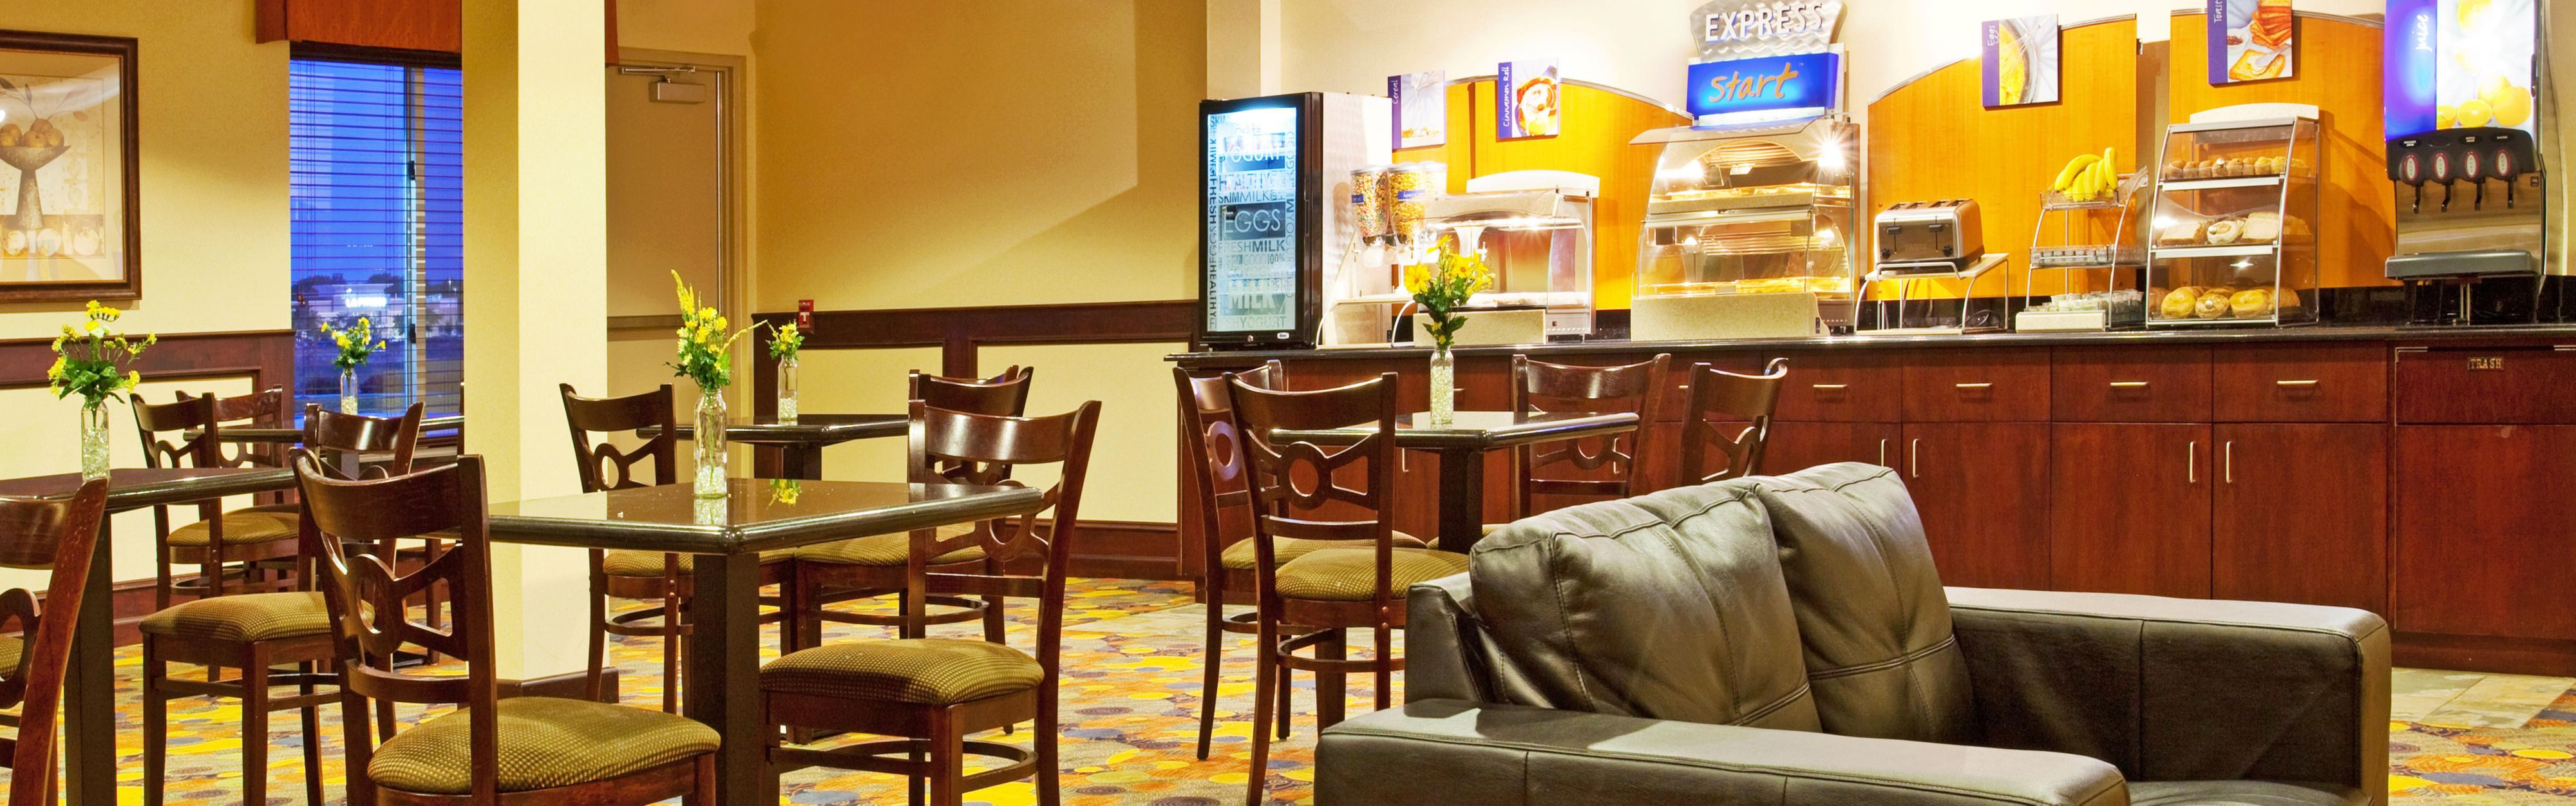 Holiday Inn Express & Suites Chicago North-Waukegan-Gurnee image 3